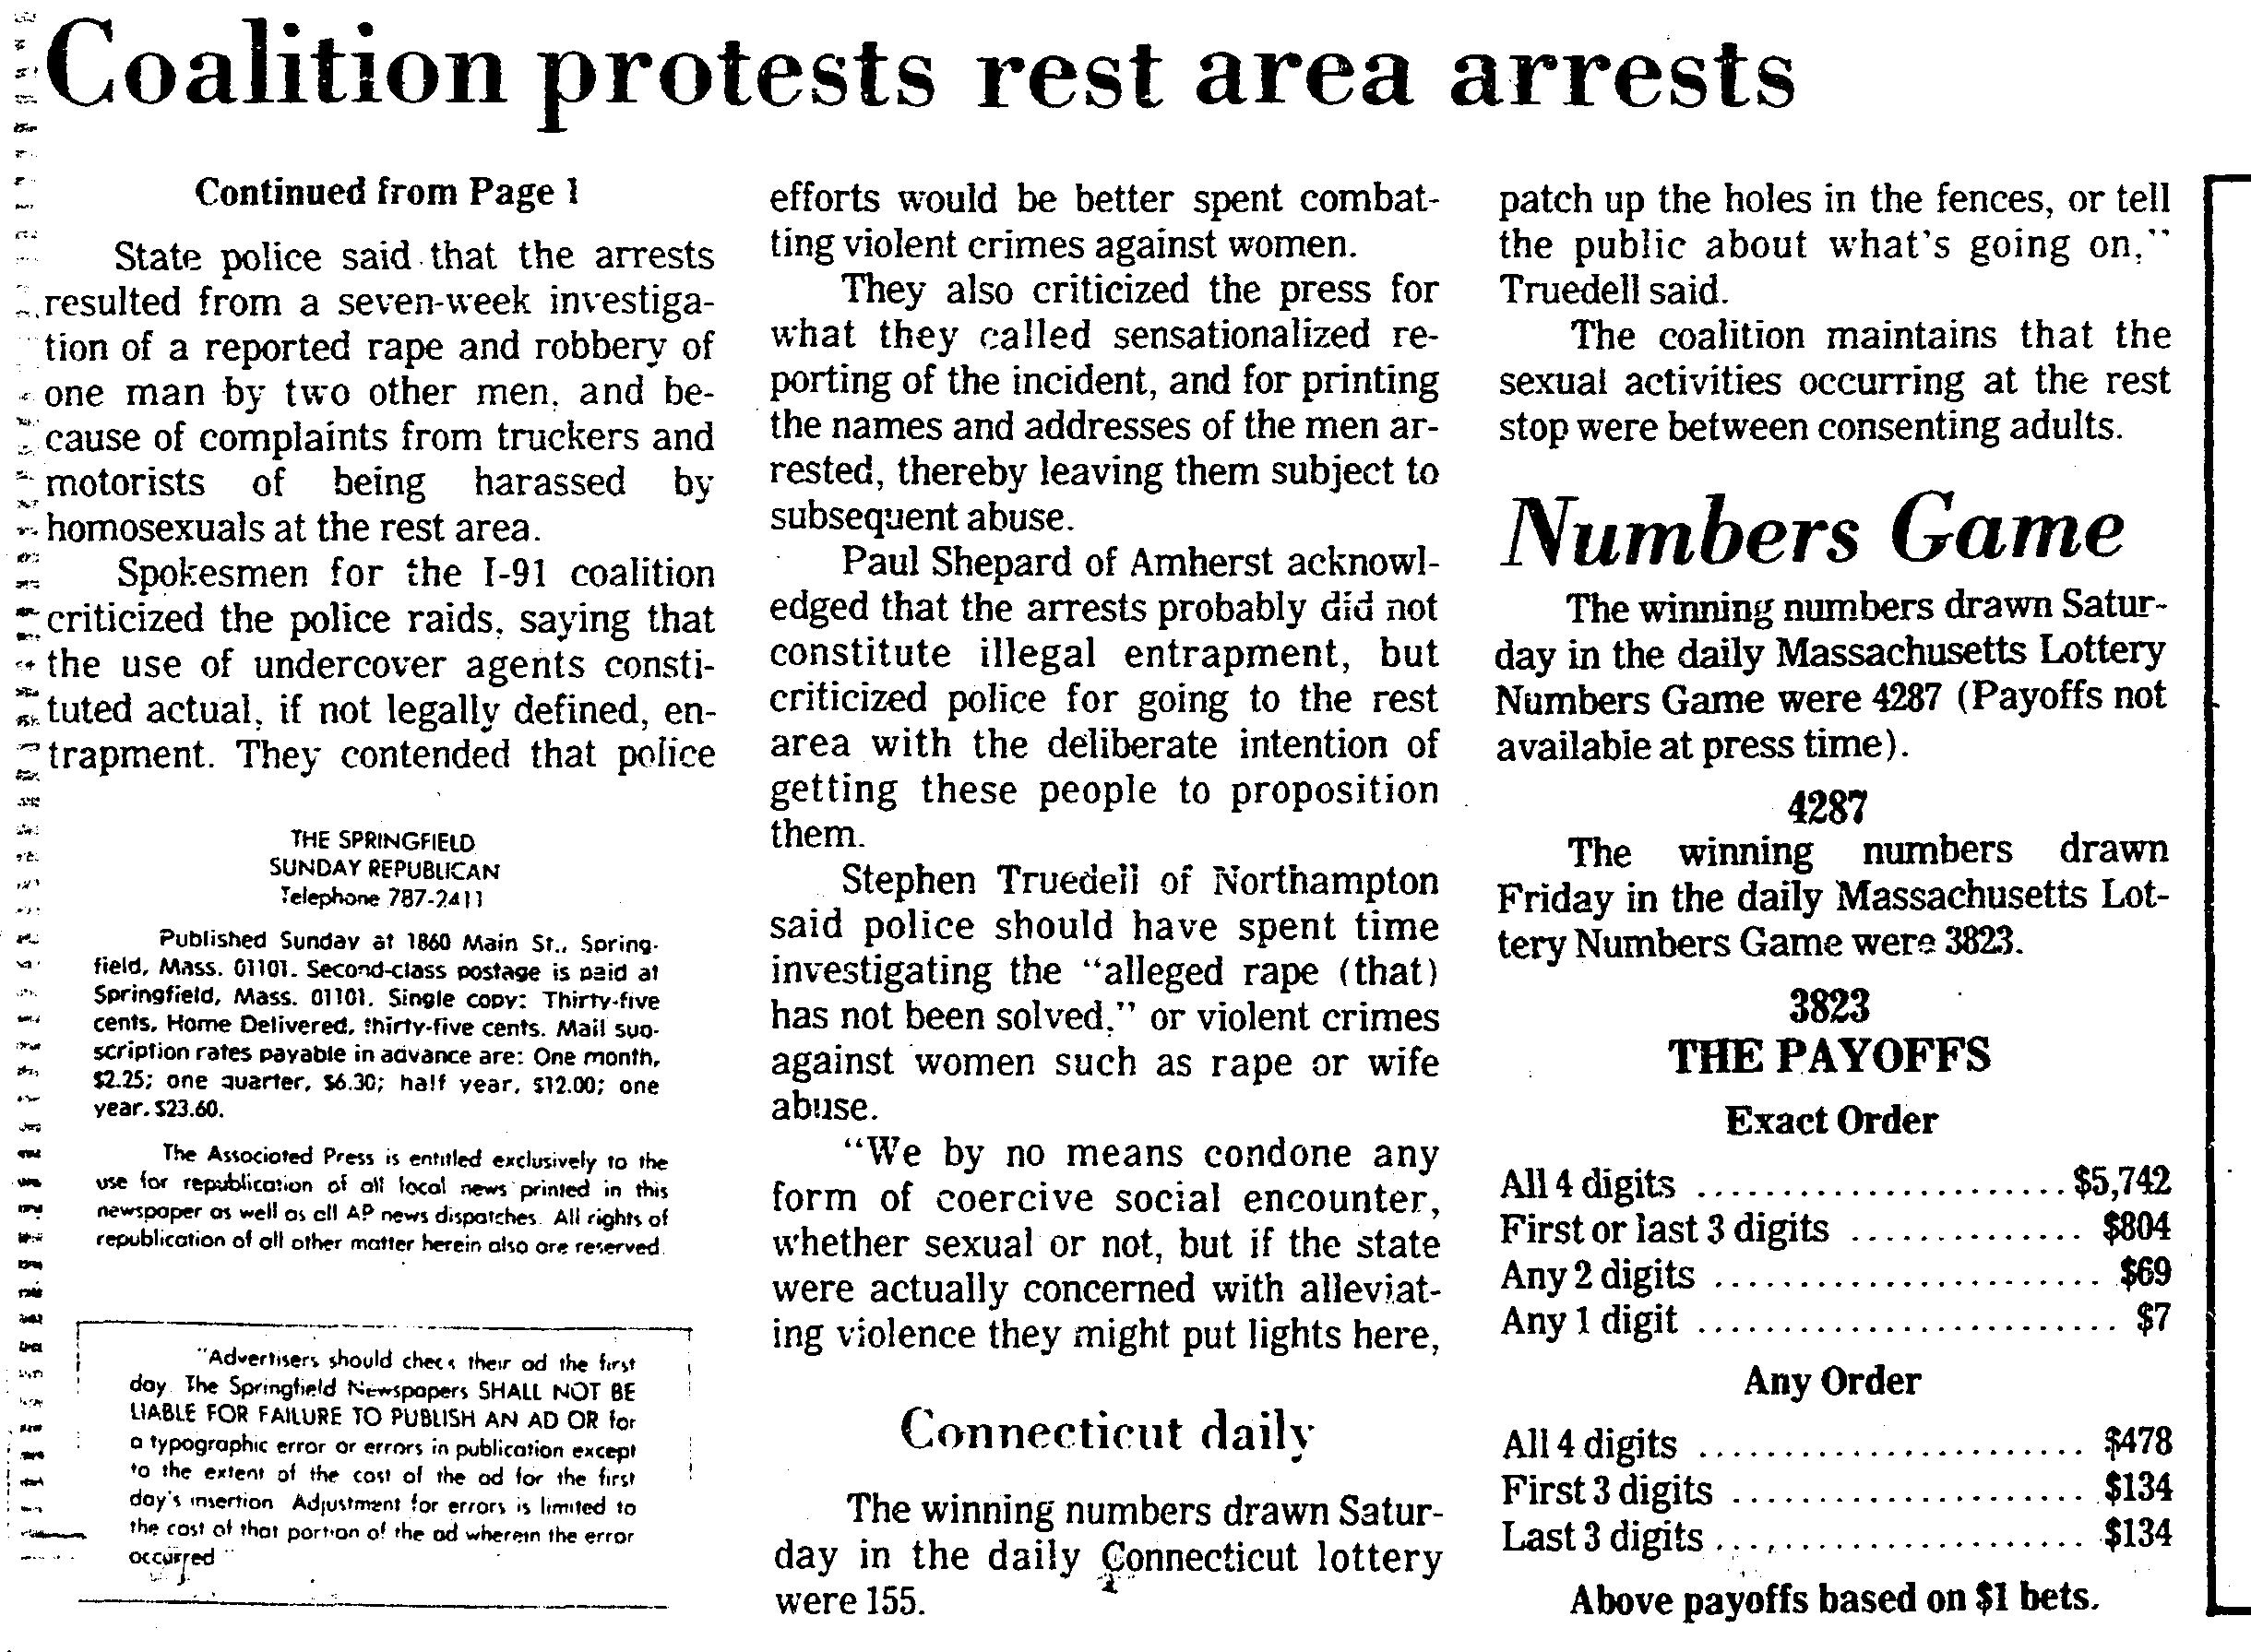 Springfield_Union_1978-11-05_2